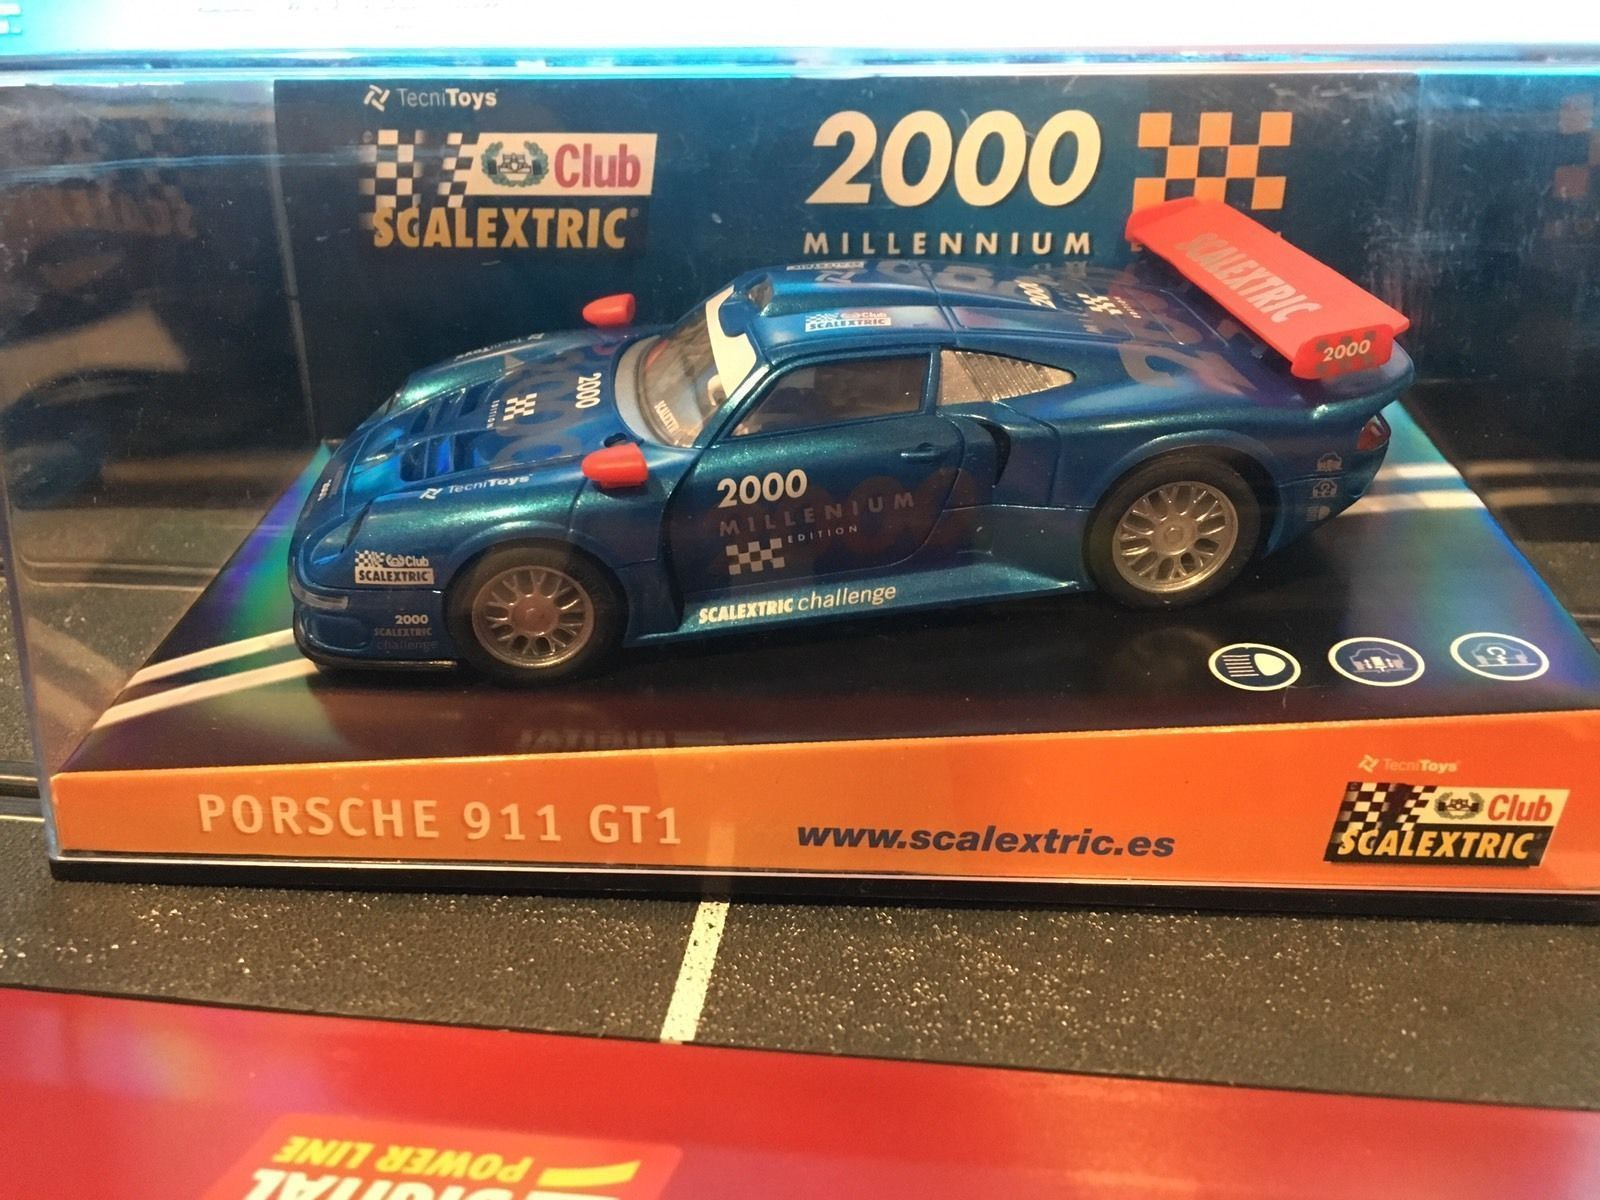 Scx Slot Car (2000s): 1 listing